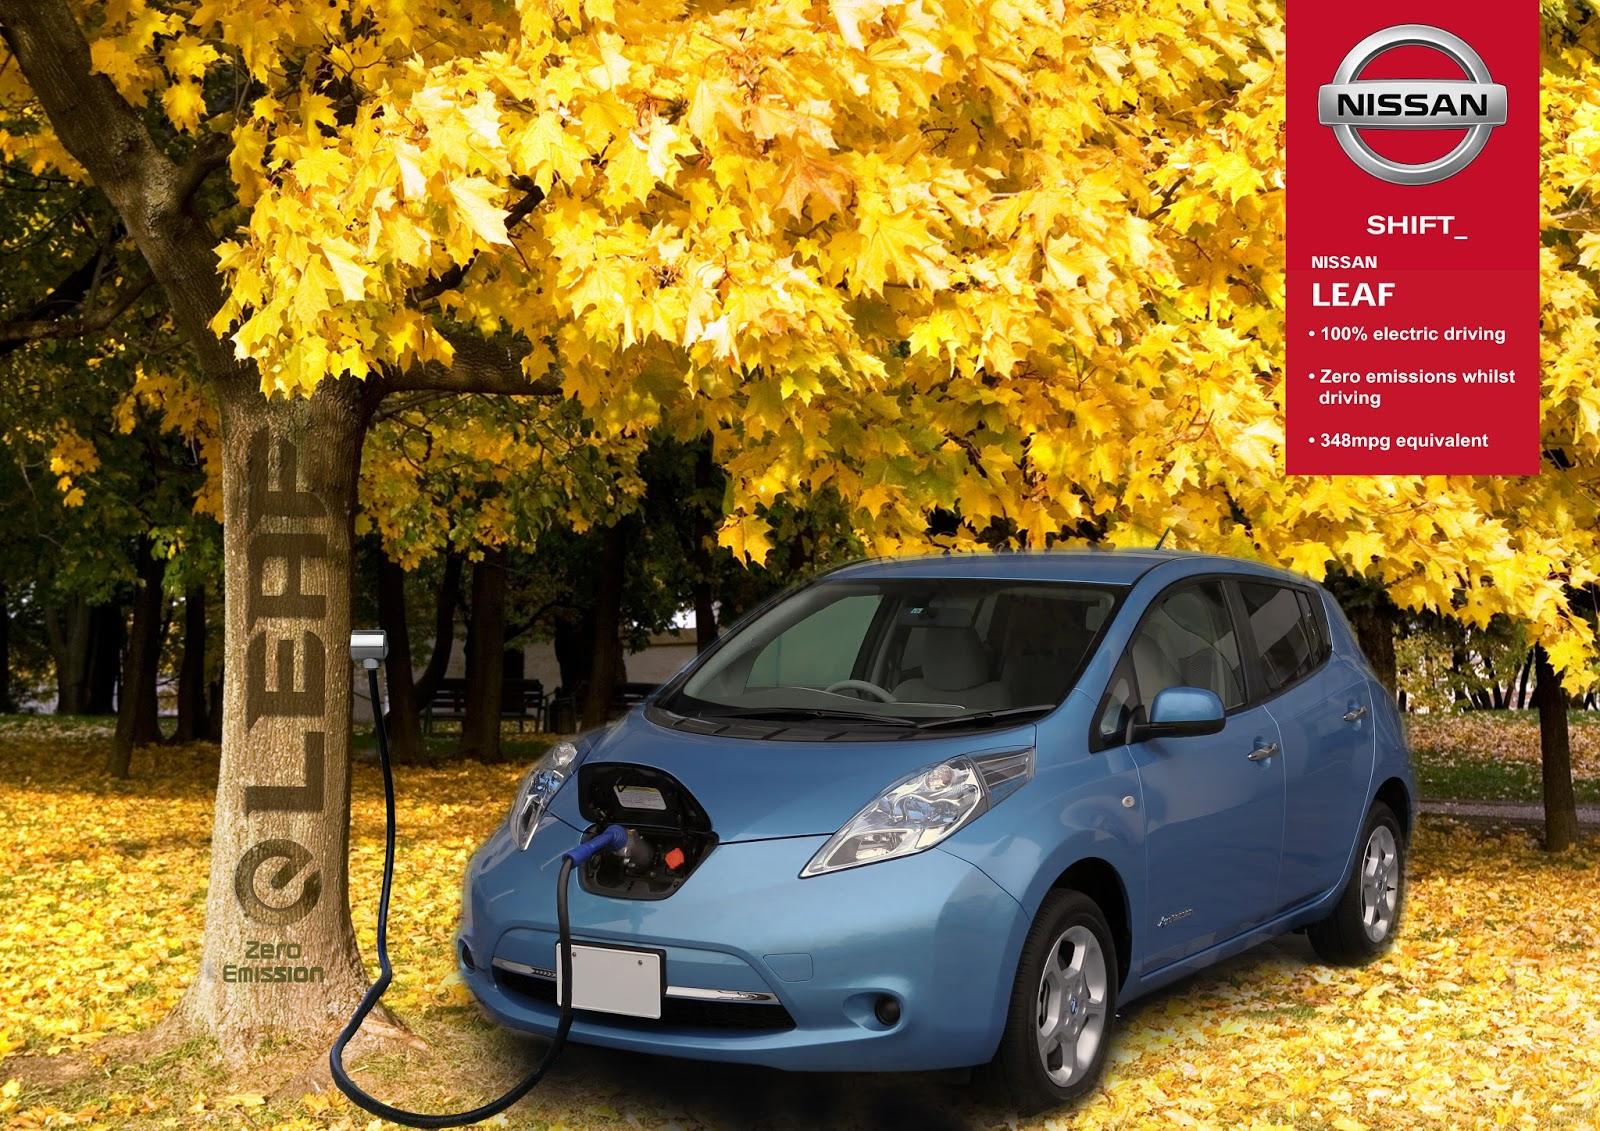 Nissan Leaf 100 Electric Car Advertisement Ycn Project